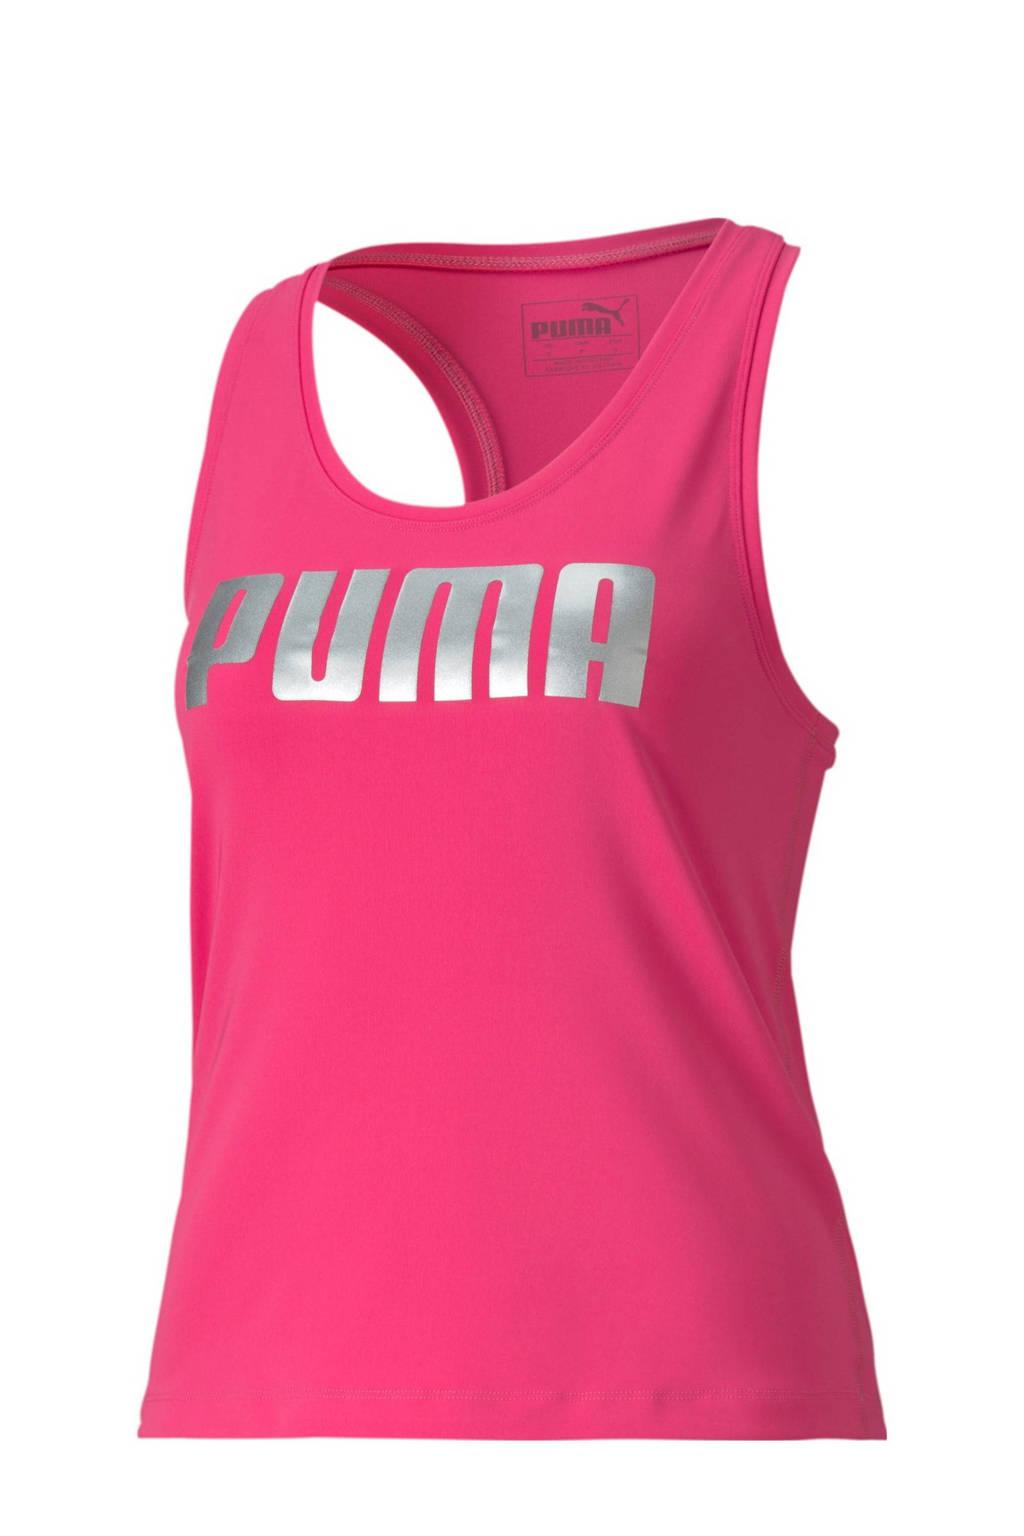 Puma mouwloze top fuchsia, Fuchsia